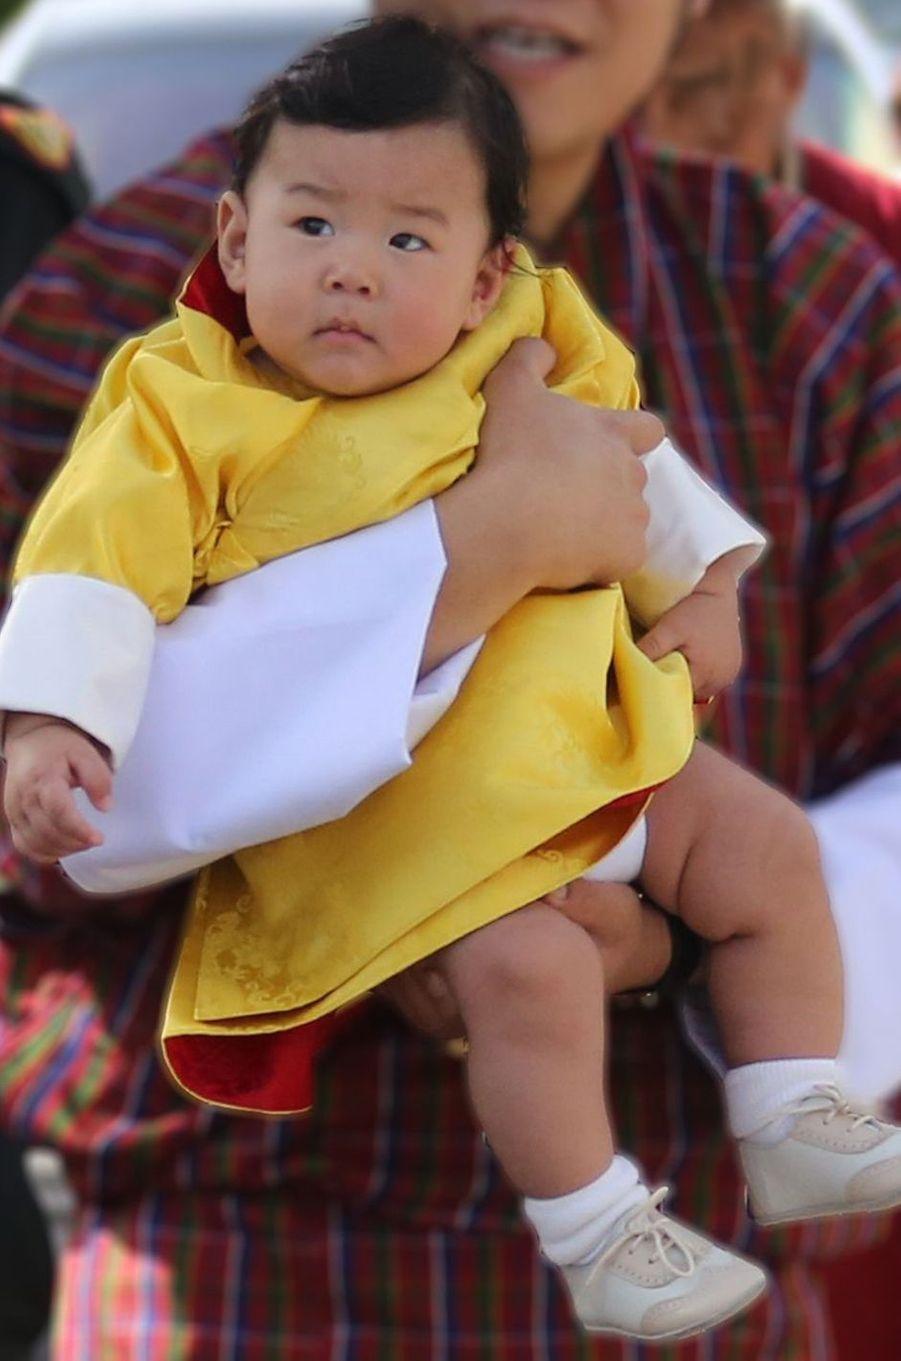 Le prince héritier du Bhoutan Jigme Namgyel Wangchuck, le 9 août 2016